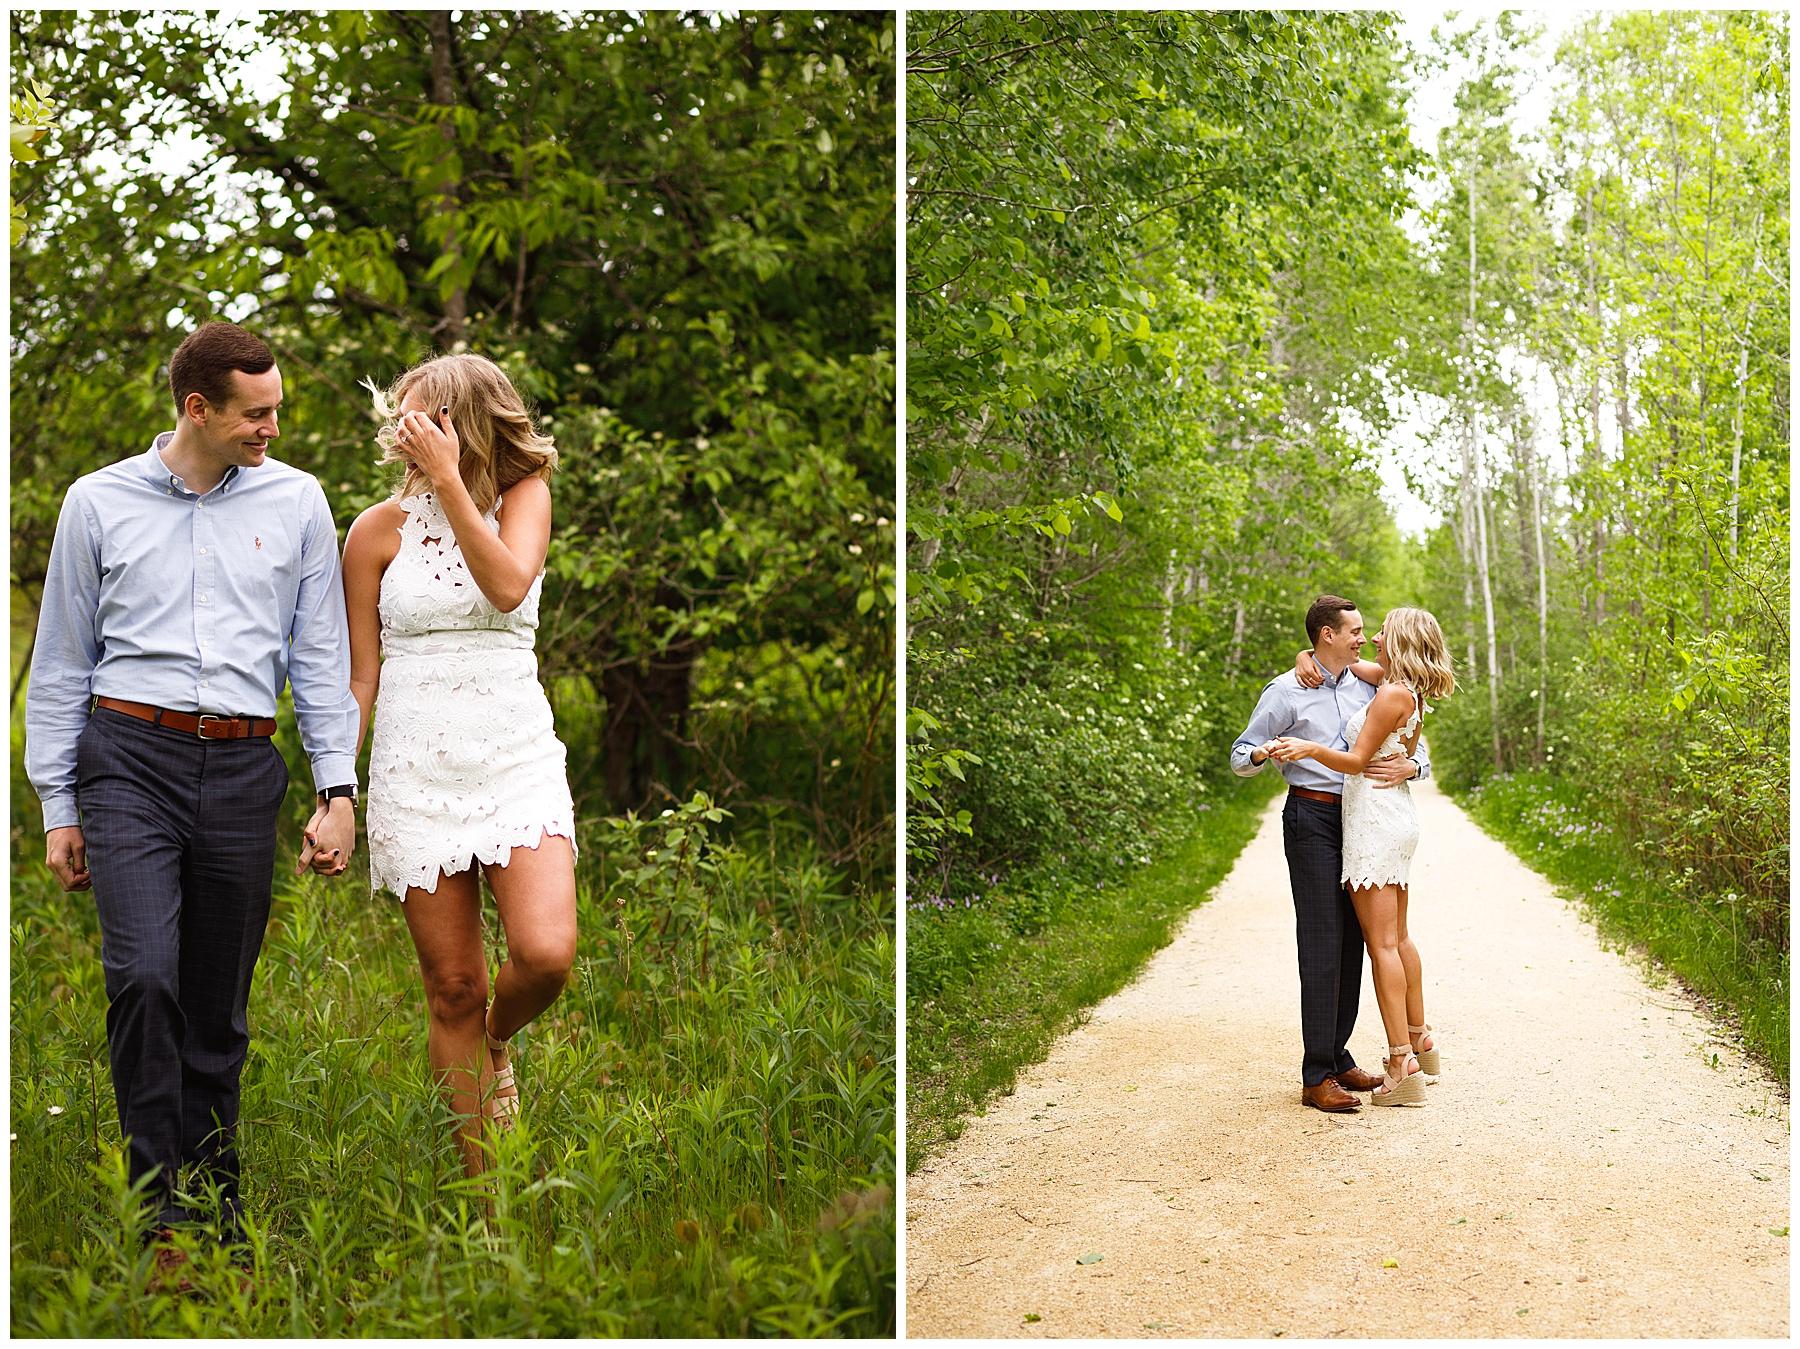 Hannah + Ben Engaged Milwaukee_0007.jpg